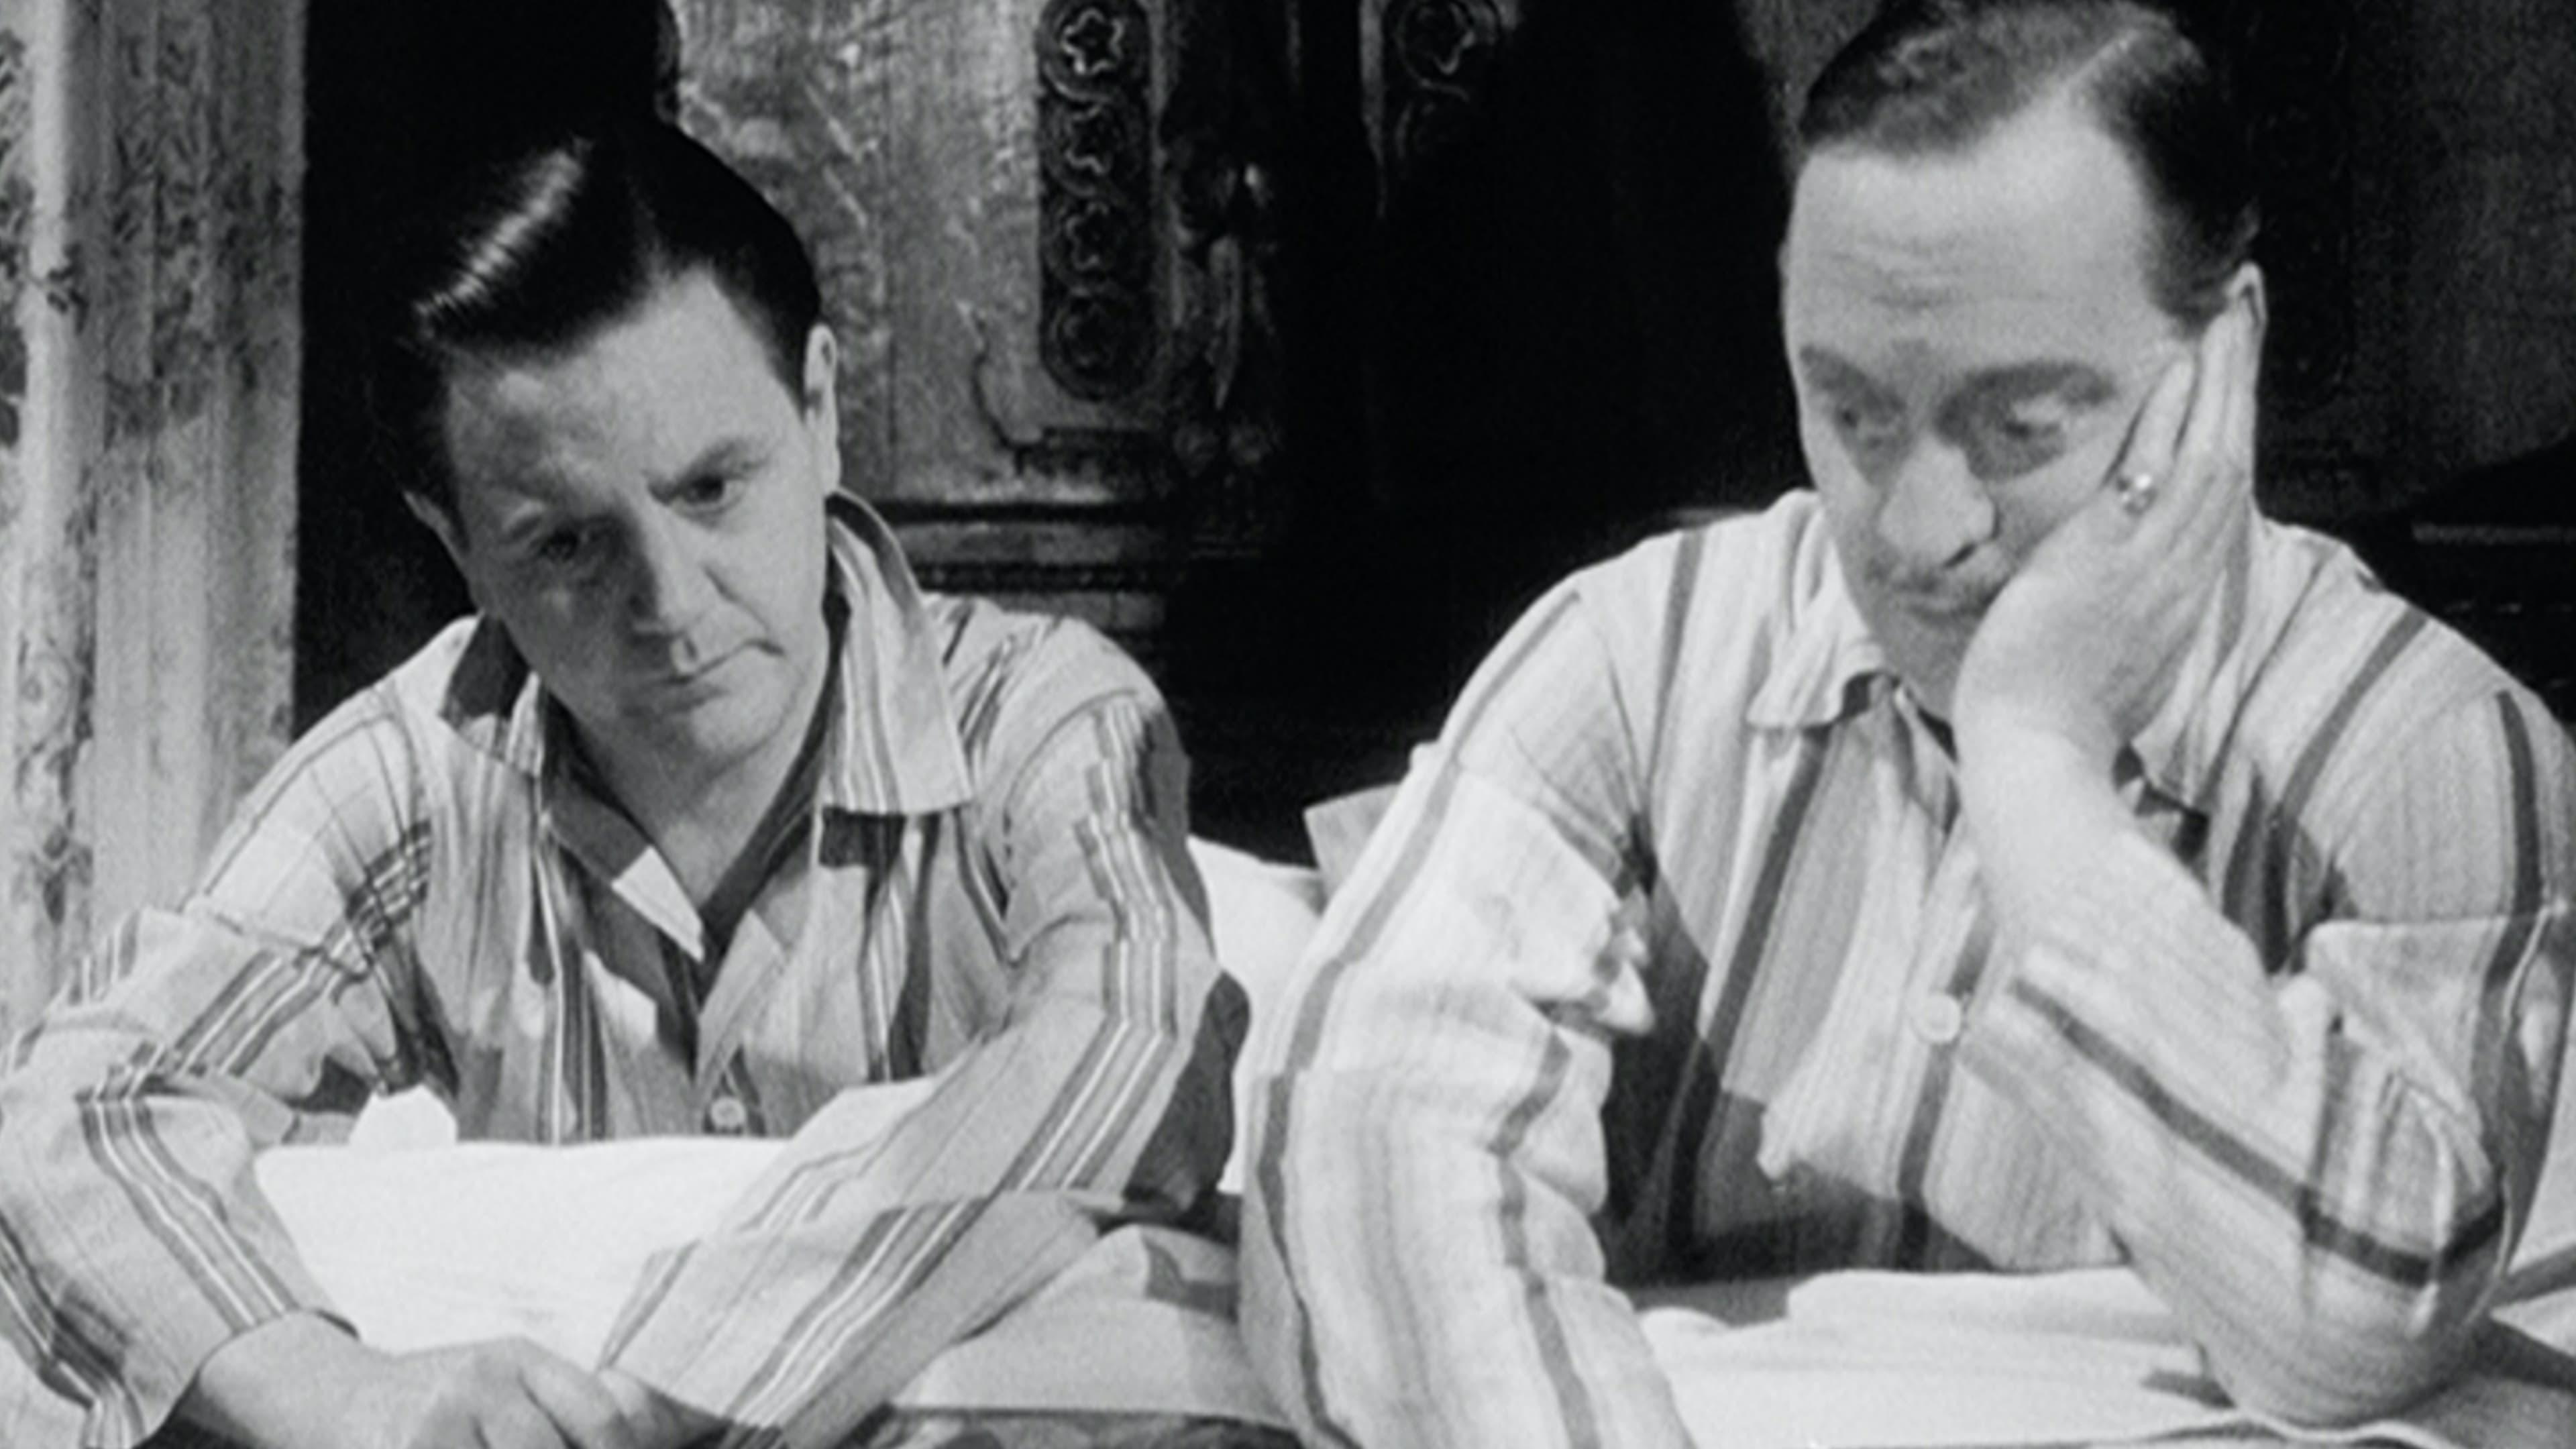 Basil Radford and Naunton Wayne in Crook's Tour (1940)